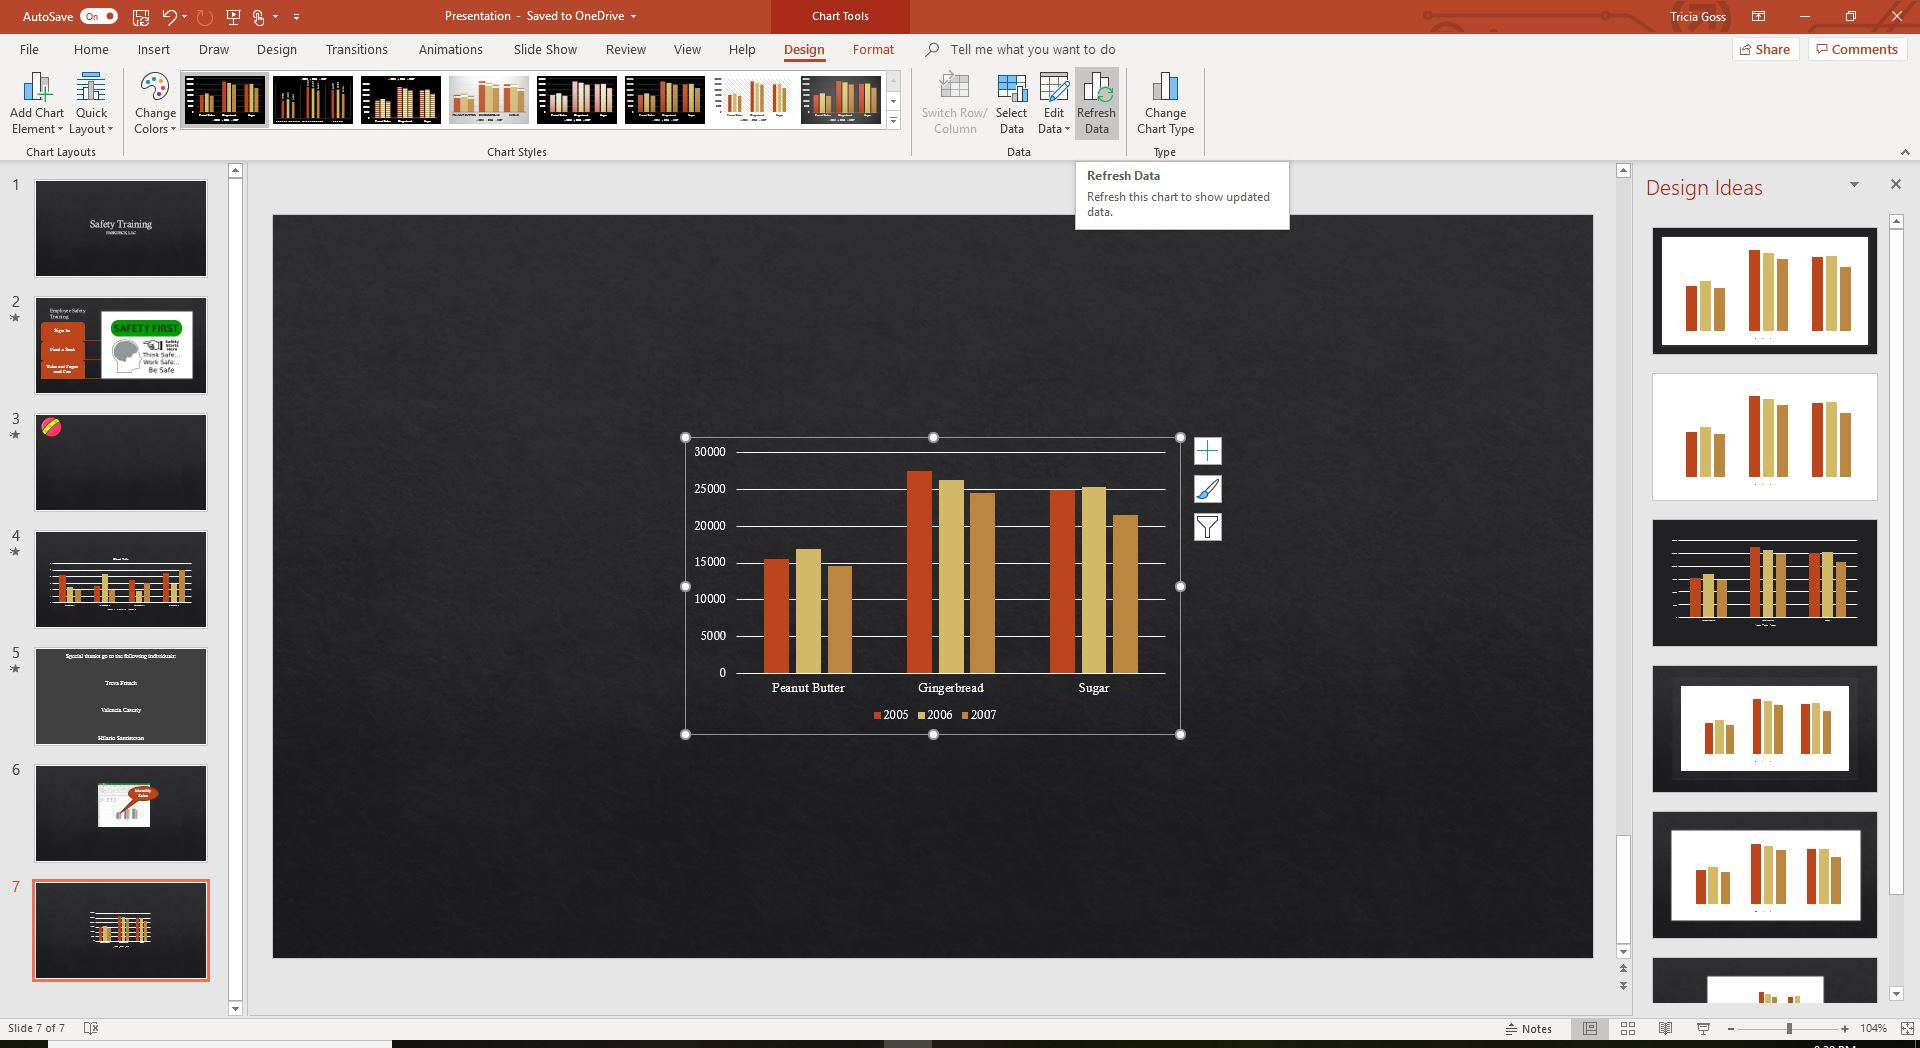 Refresh chart data in PowerPoint